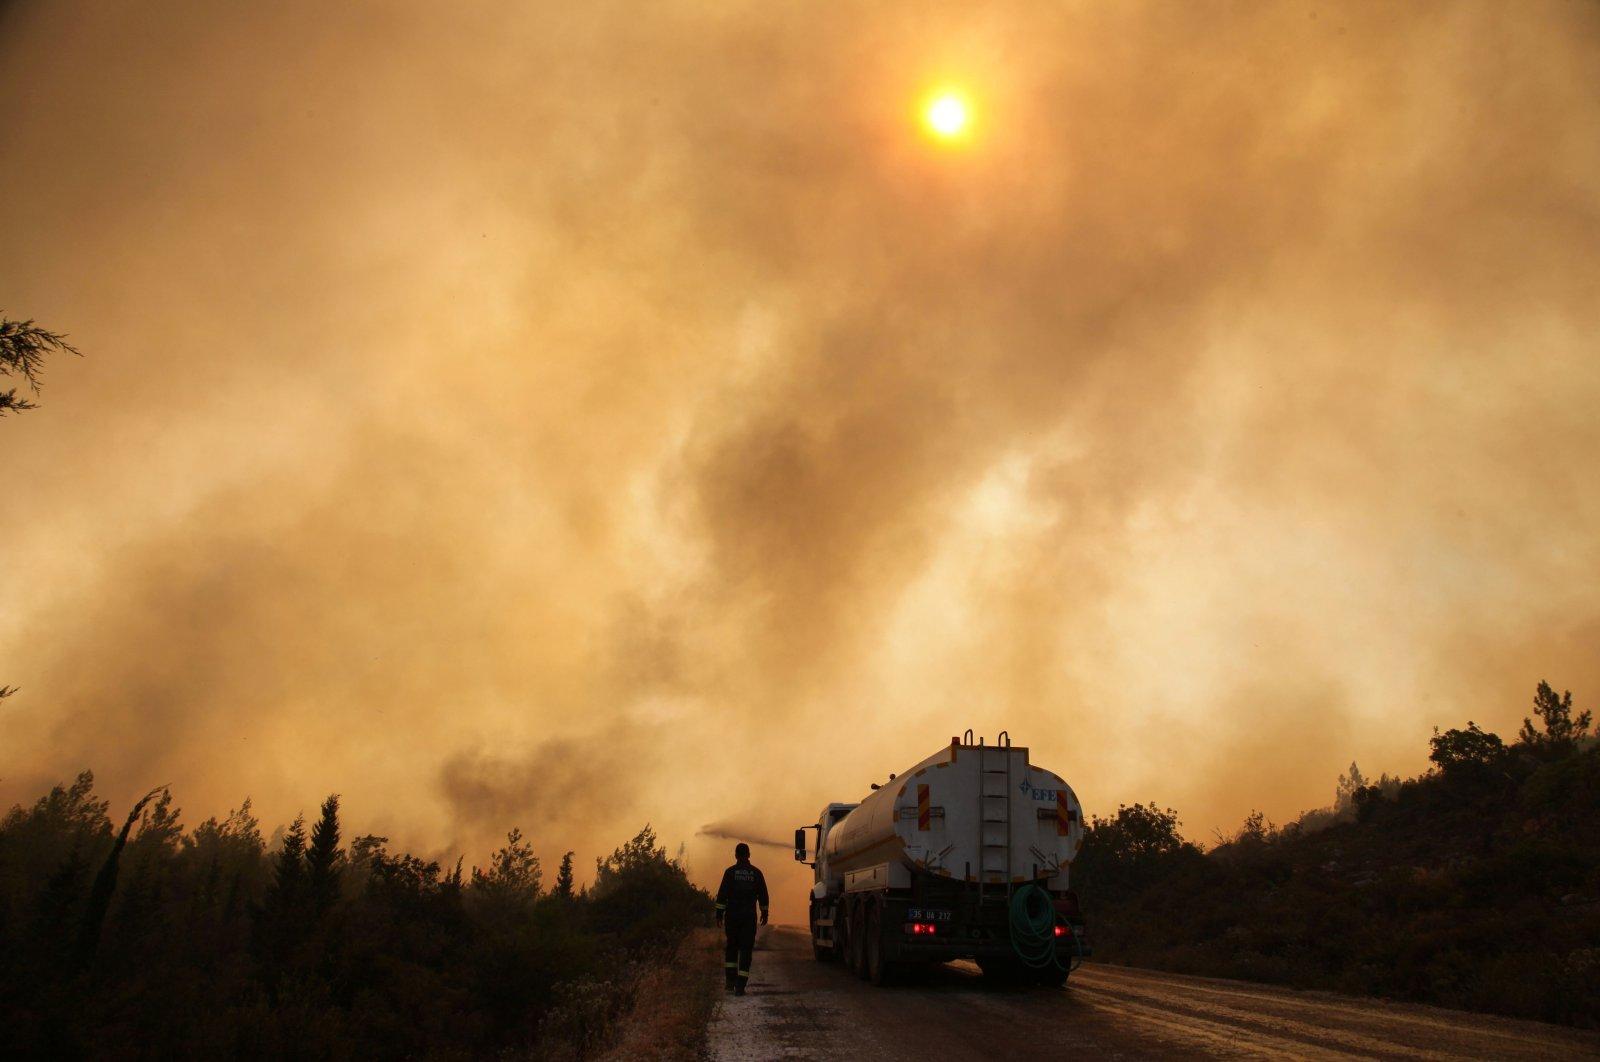 Firefighters extinguish a wildfire in the Mazı neighborhood near Bodrum, in Muğla, southwestern Turkey, August 2, 2021. (Reuters Photo)